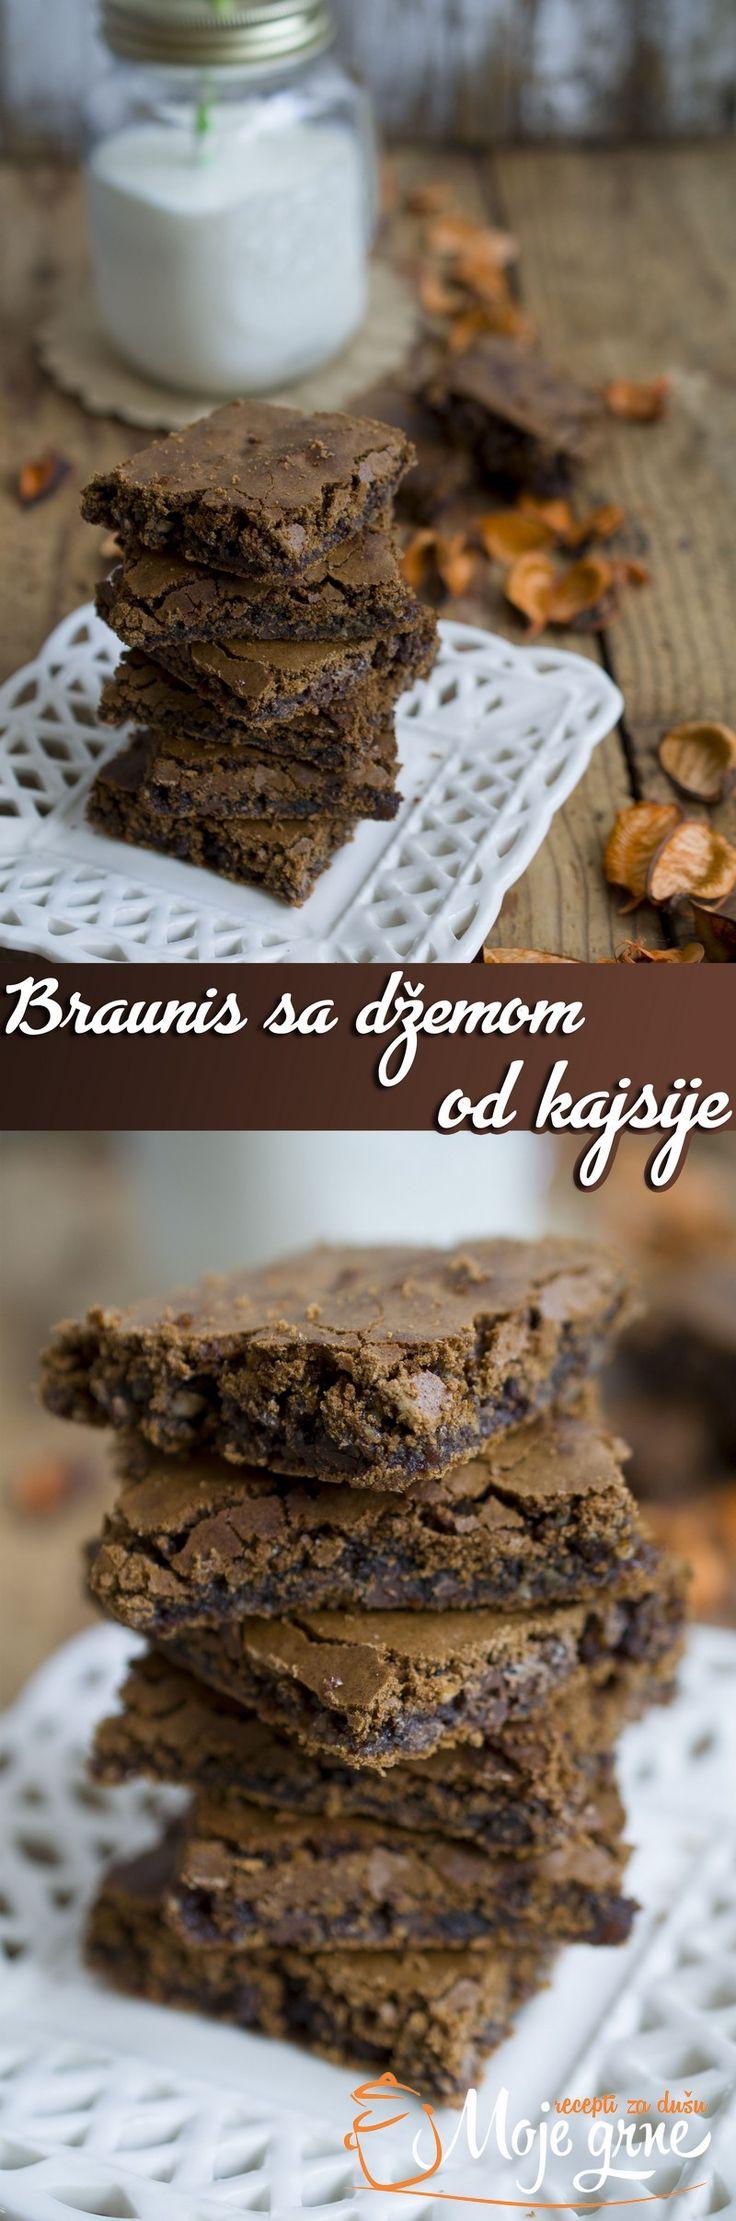 Braunis sa džemom od kajsije  #foodblogger #sweet #brownies #MojeGrne #homemade